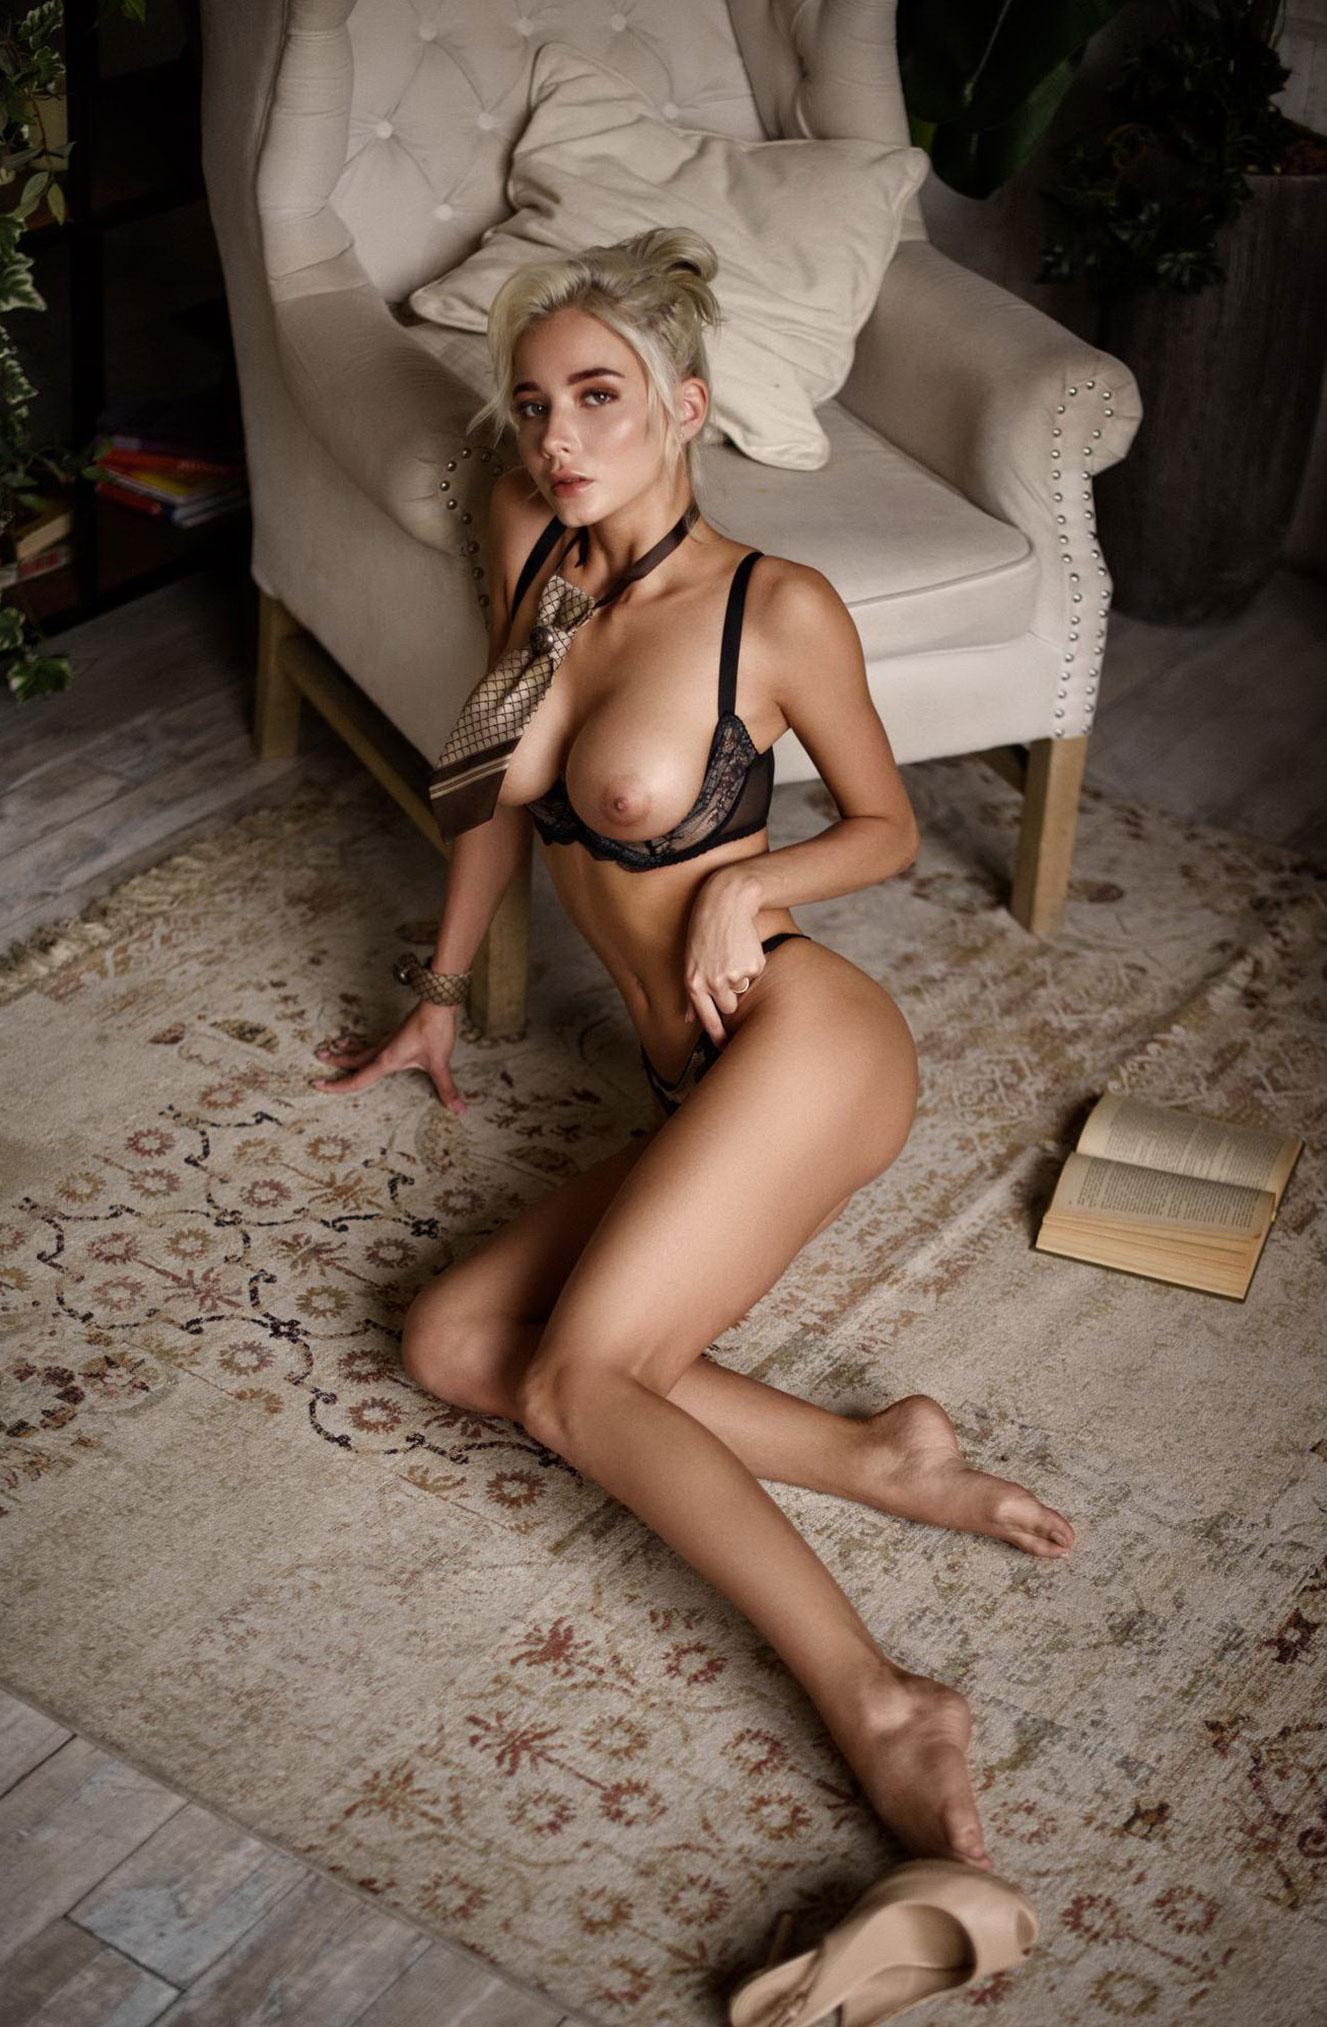 Екатерина Ширяева - голая, но в галстуке / фото 04